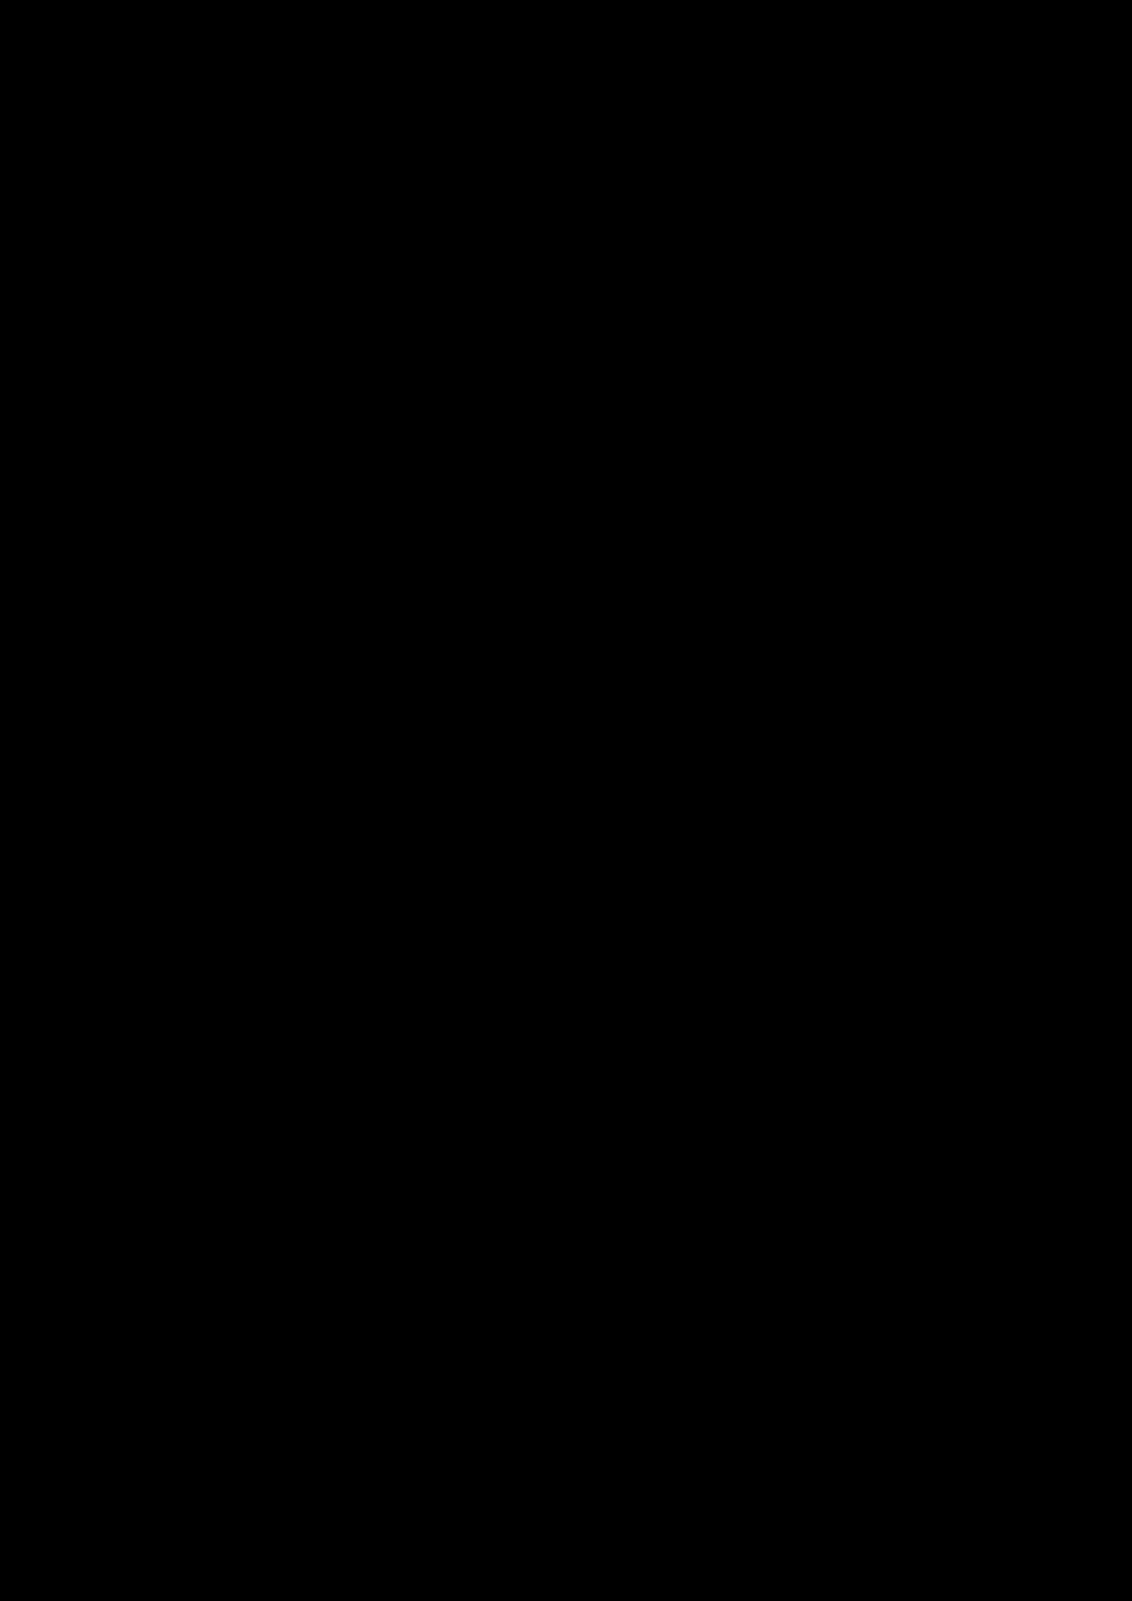 Menshe nas slide, Image 6